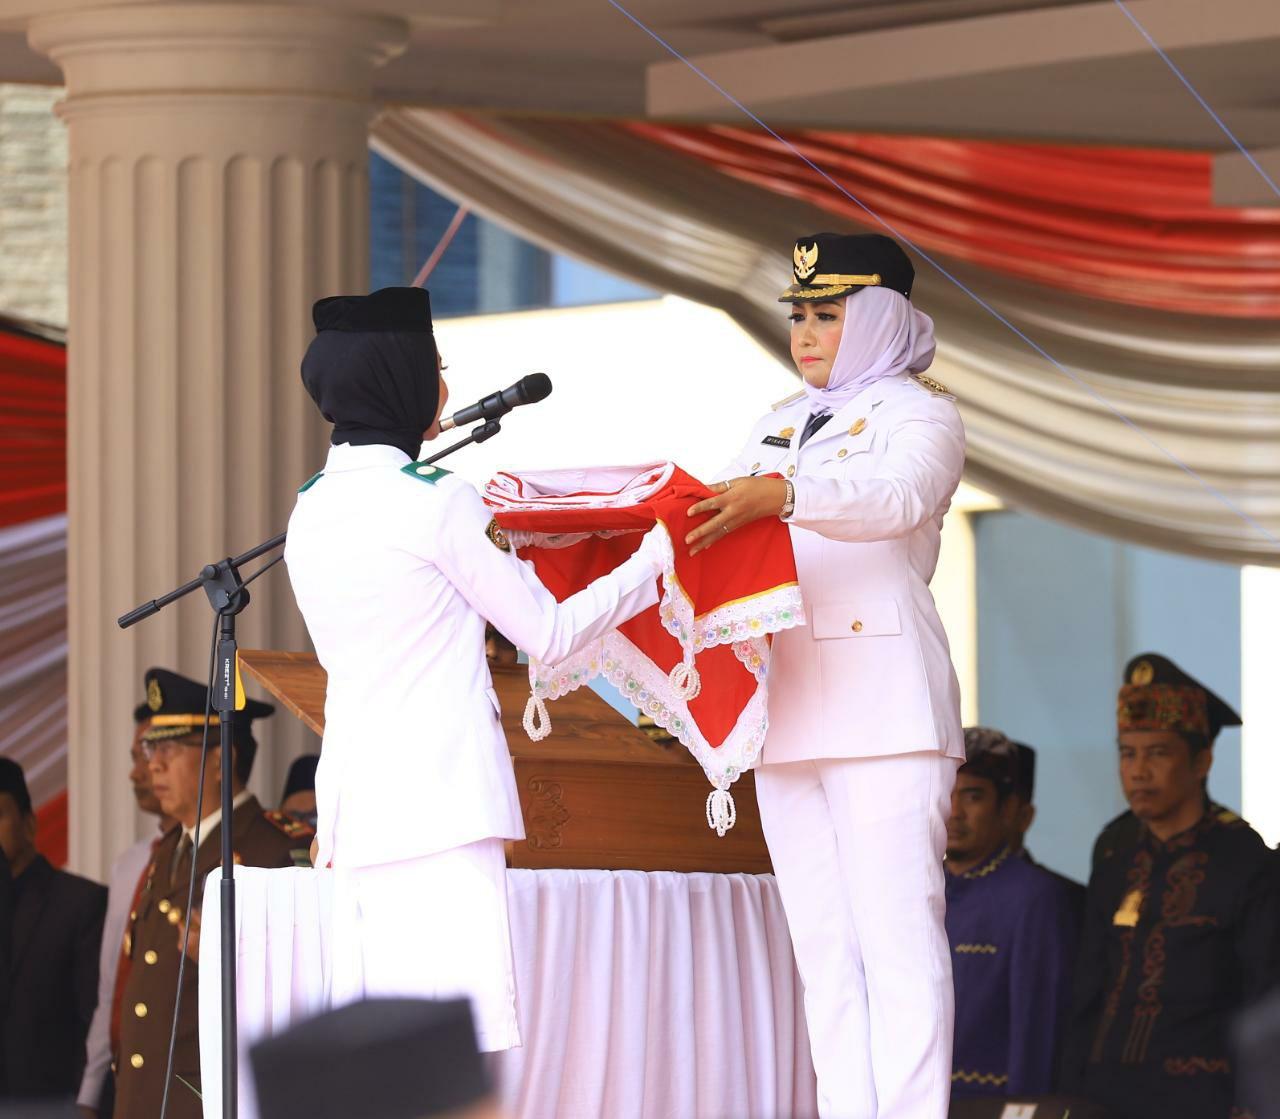 HUT RI Yang Ke-74 Bupati Tuba Pimpin Upacara Pengibaran Bendera Merah Putih.